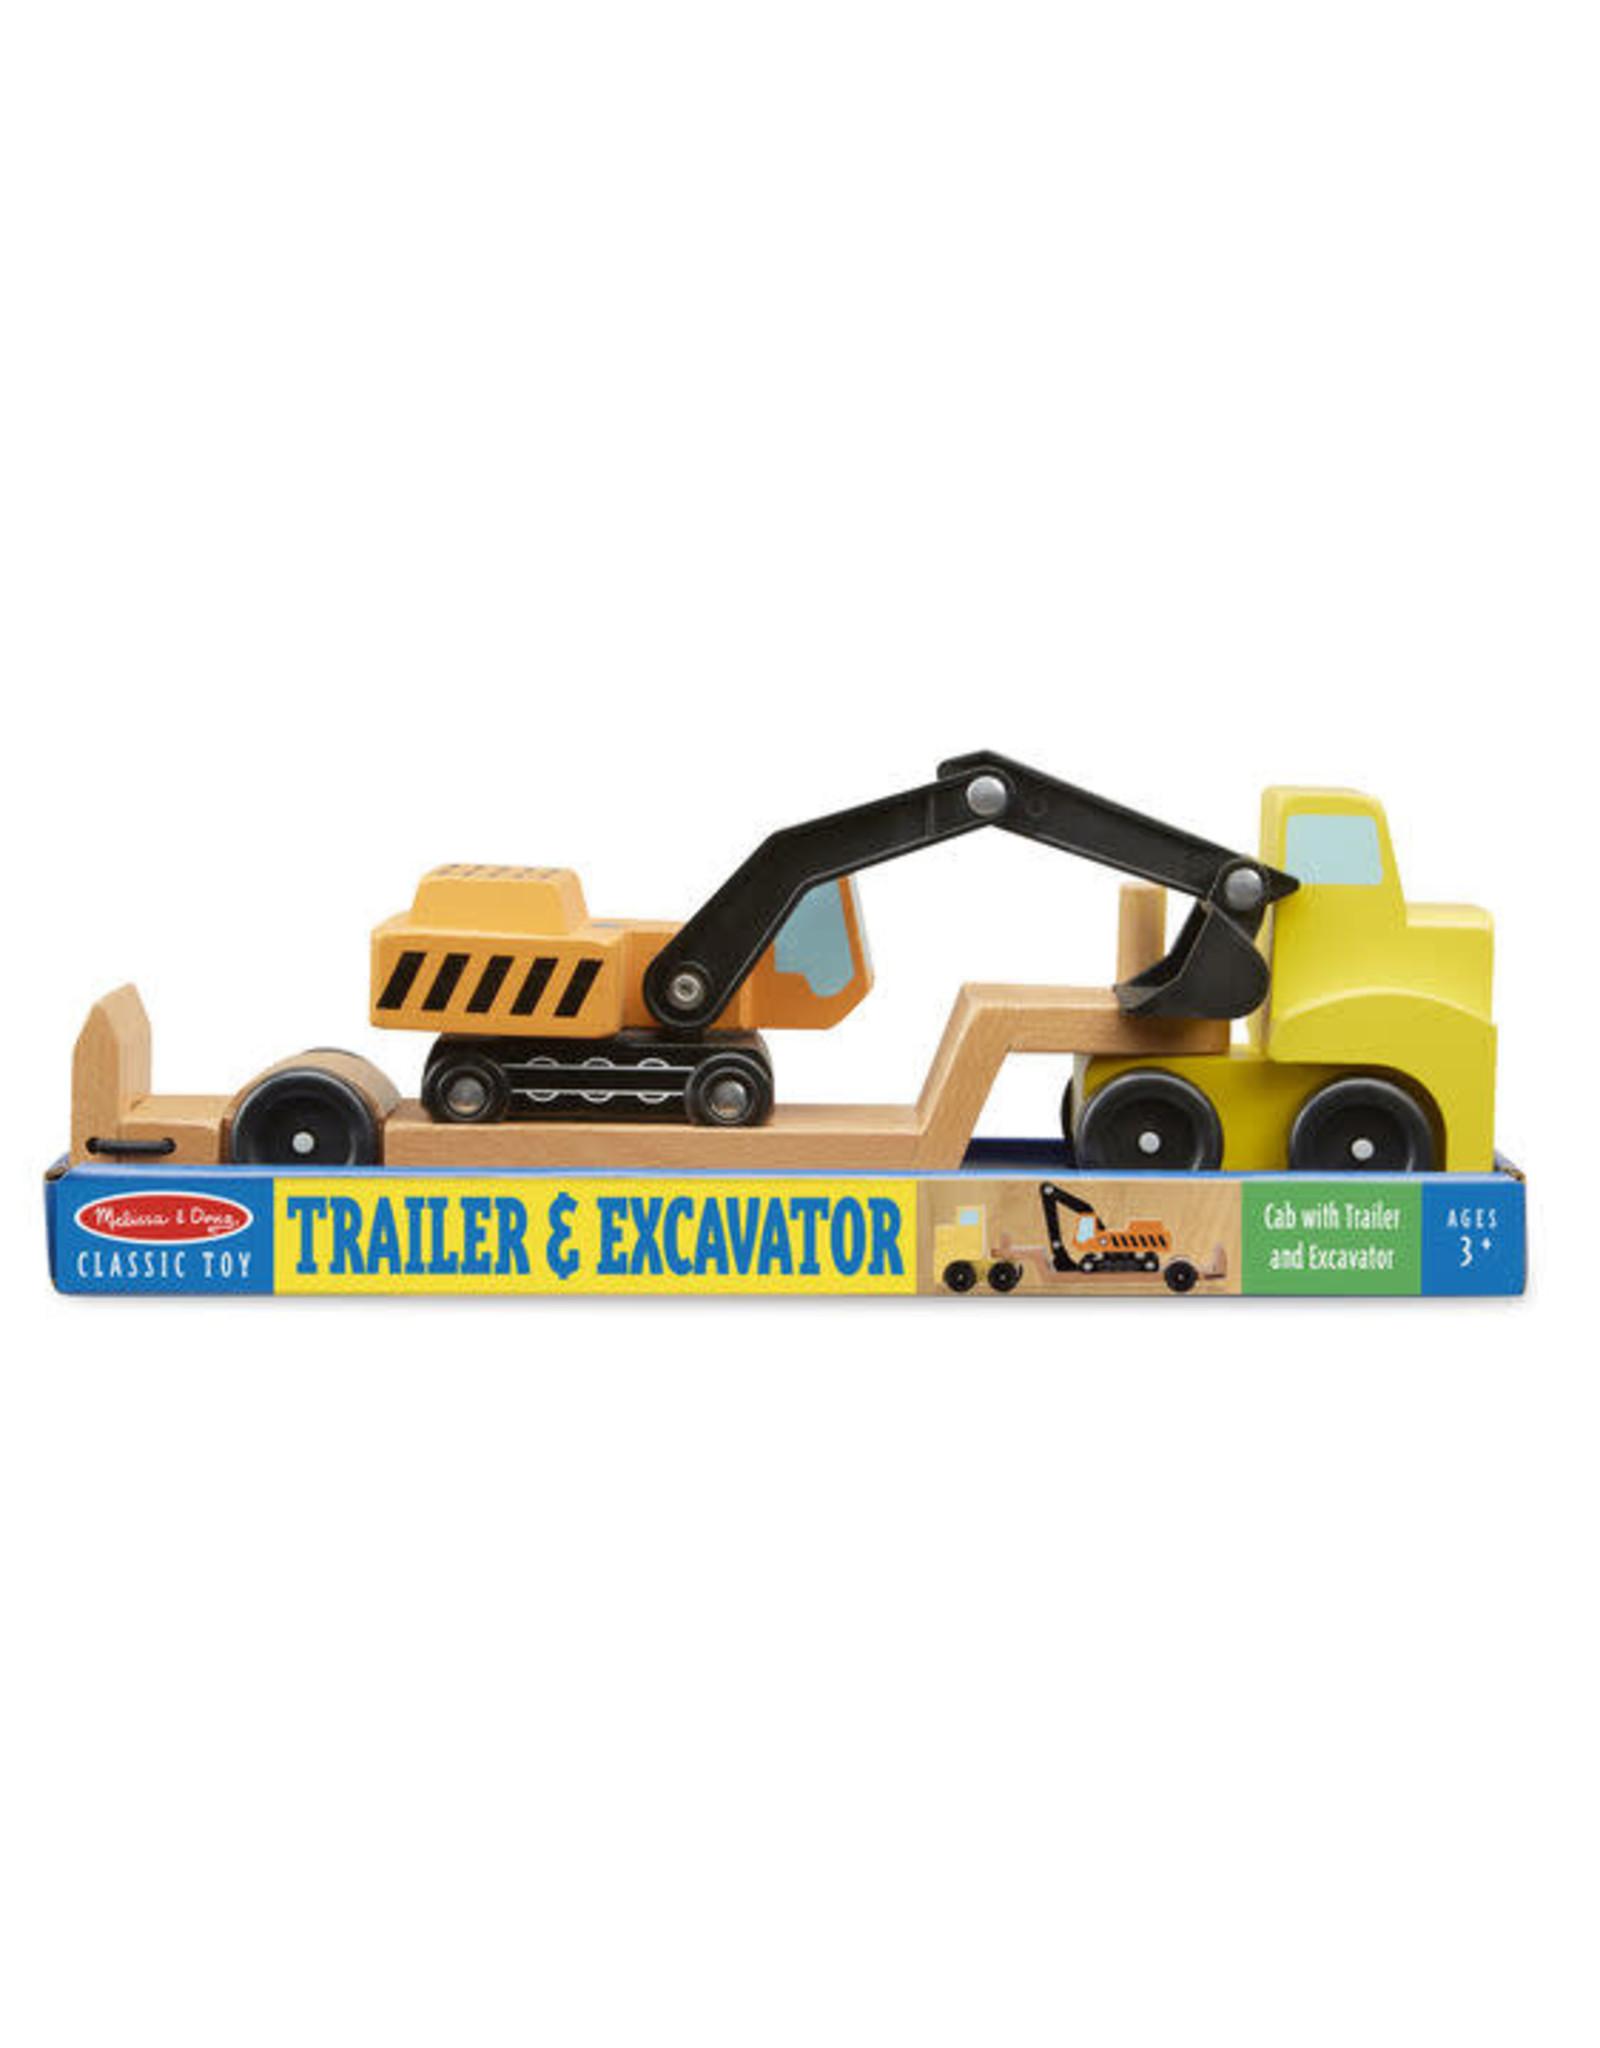 Melissa & Doug Trailer & Excavator